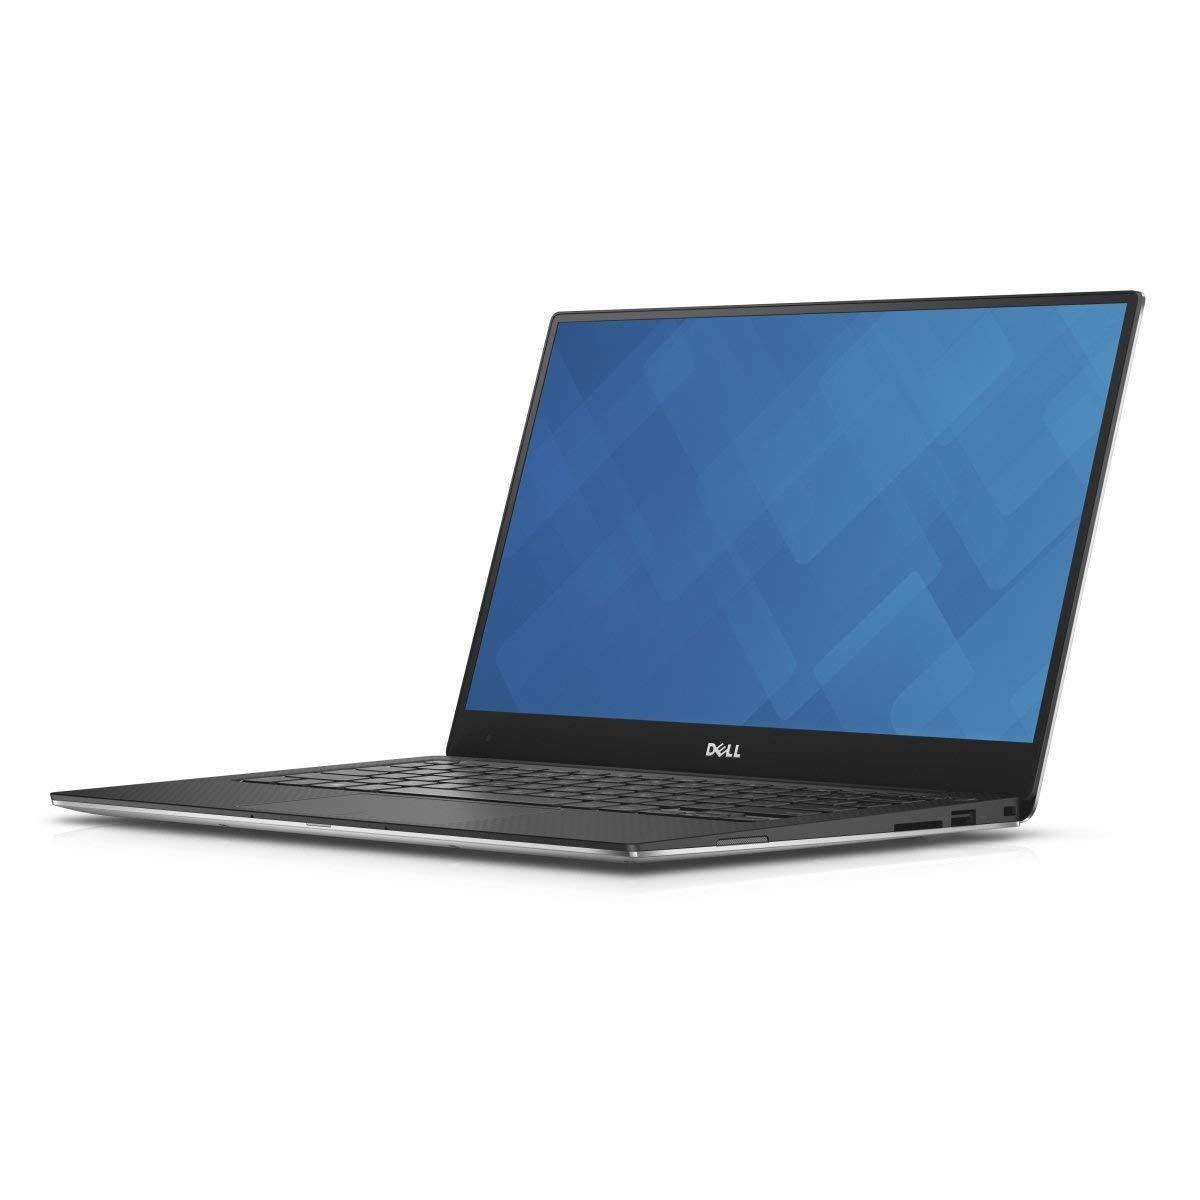 "Dell XPS 13-9350 Intel Core i7-6560U X2 2.2GHz 16GB 512GB SSD 13.3"", Silver (Ref"